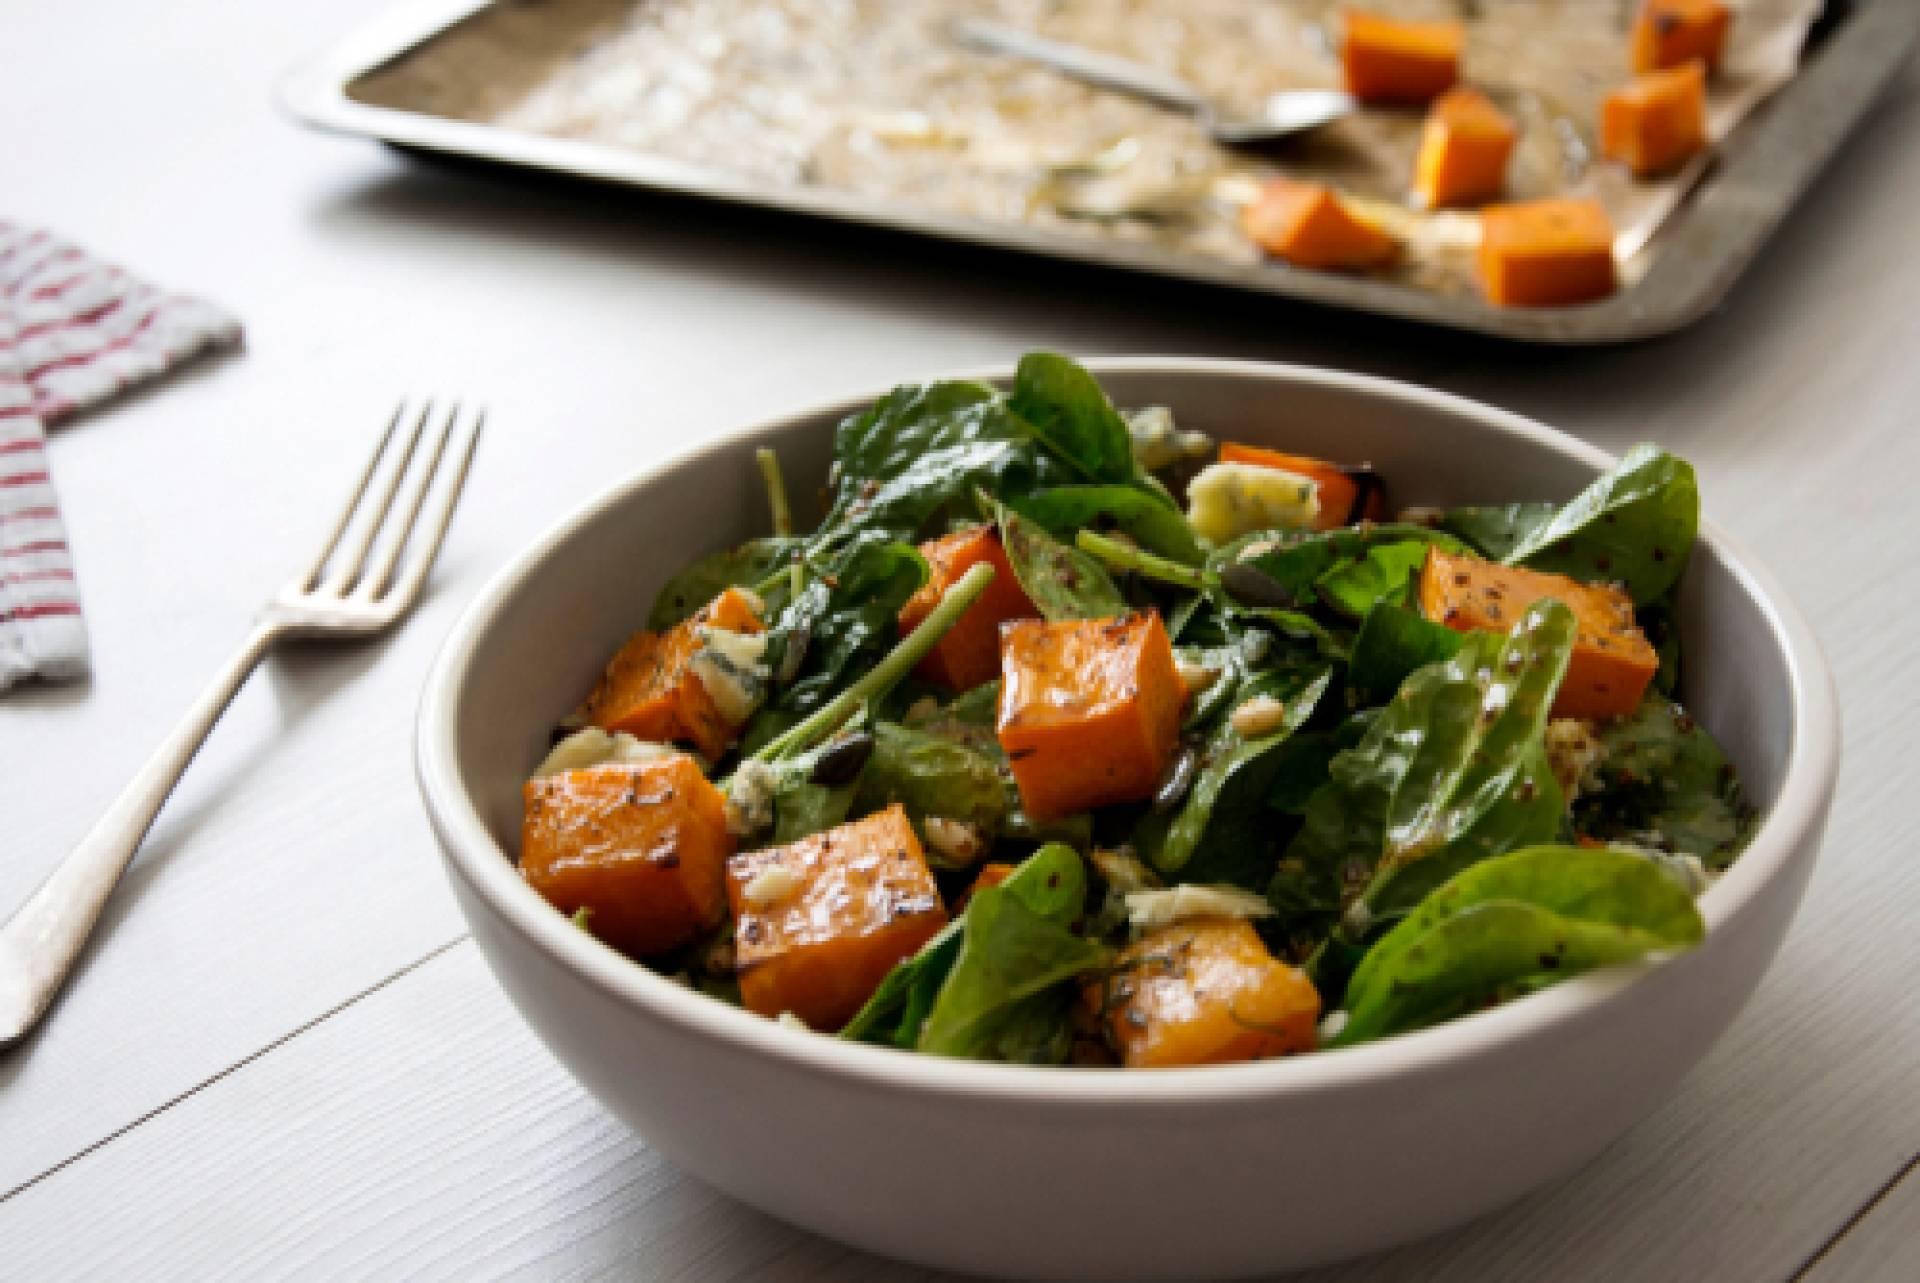 Fall Arugula Salad-add on